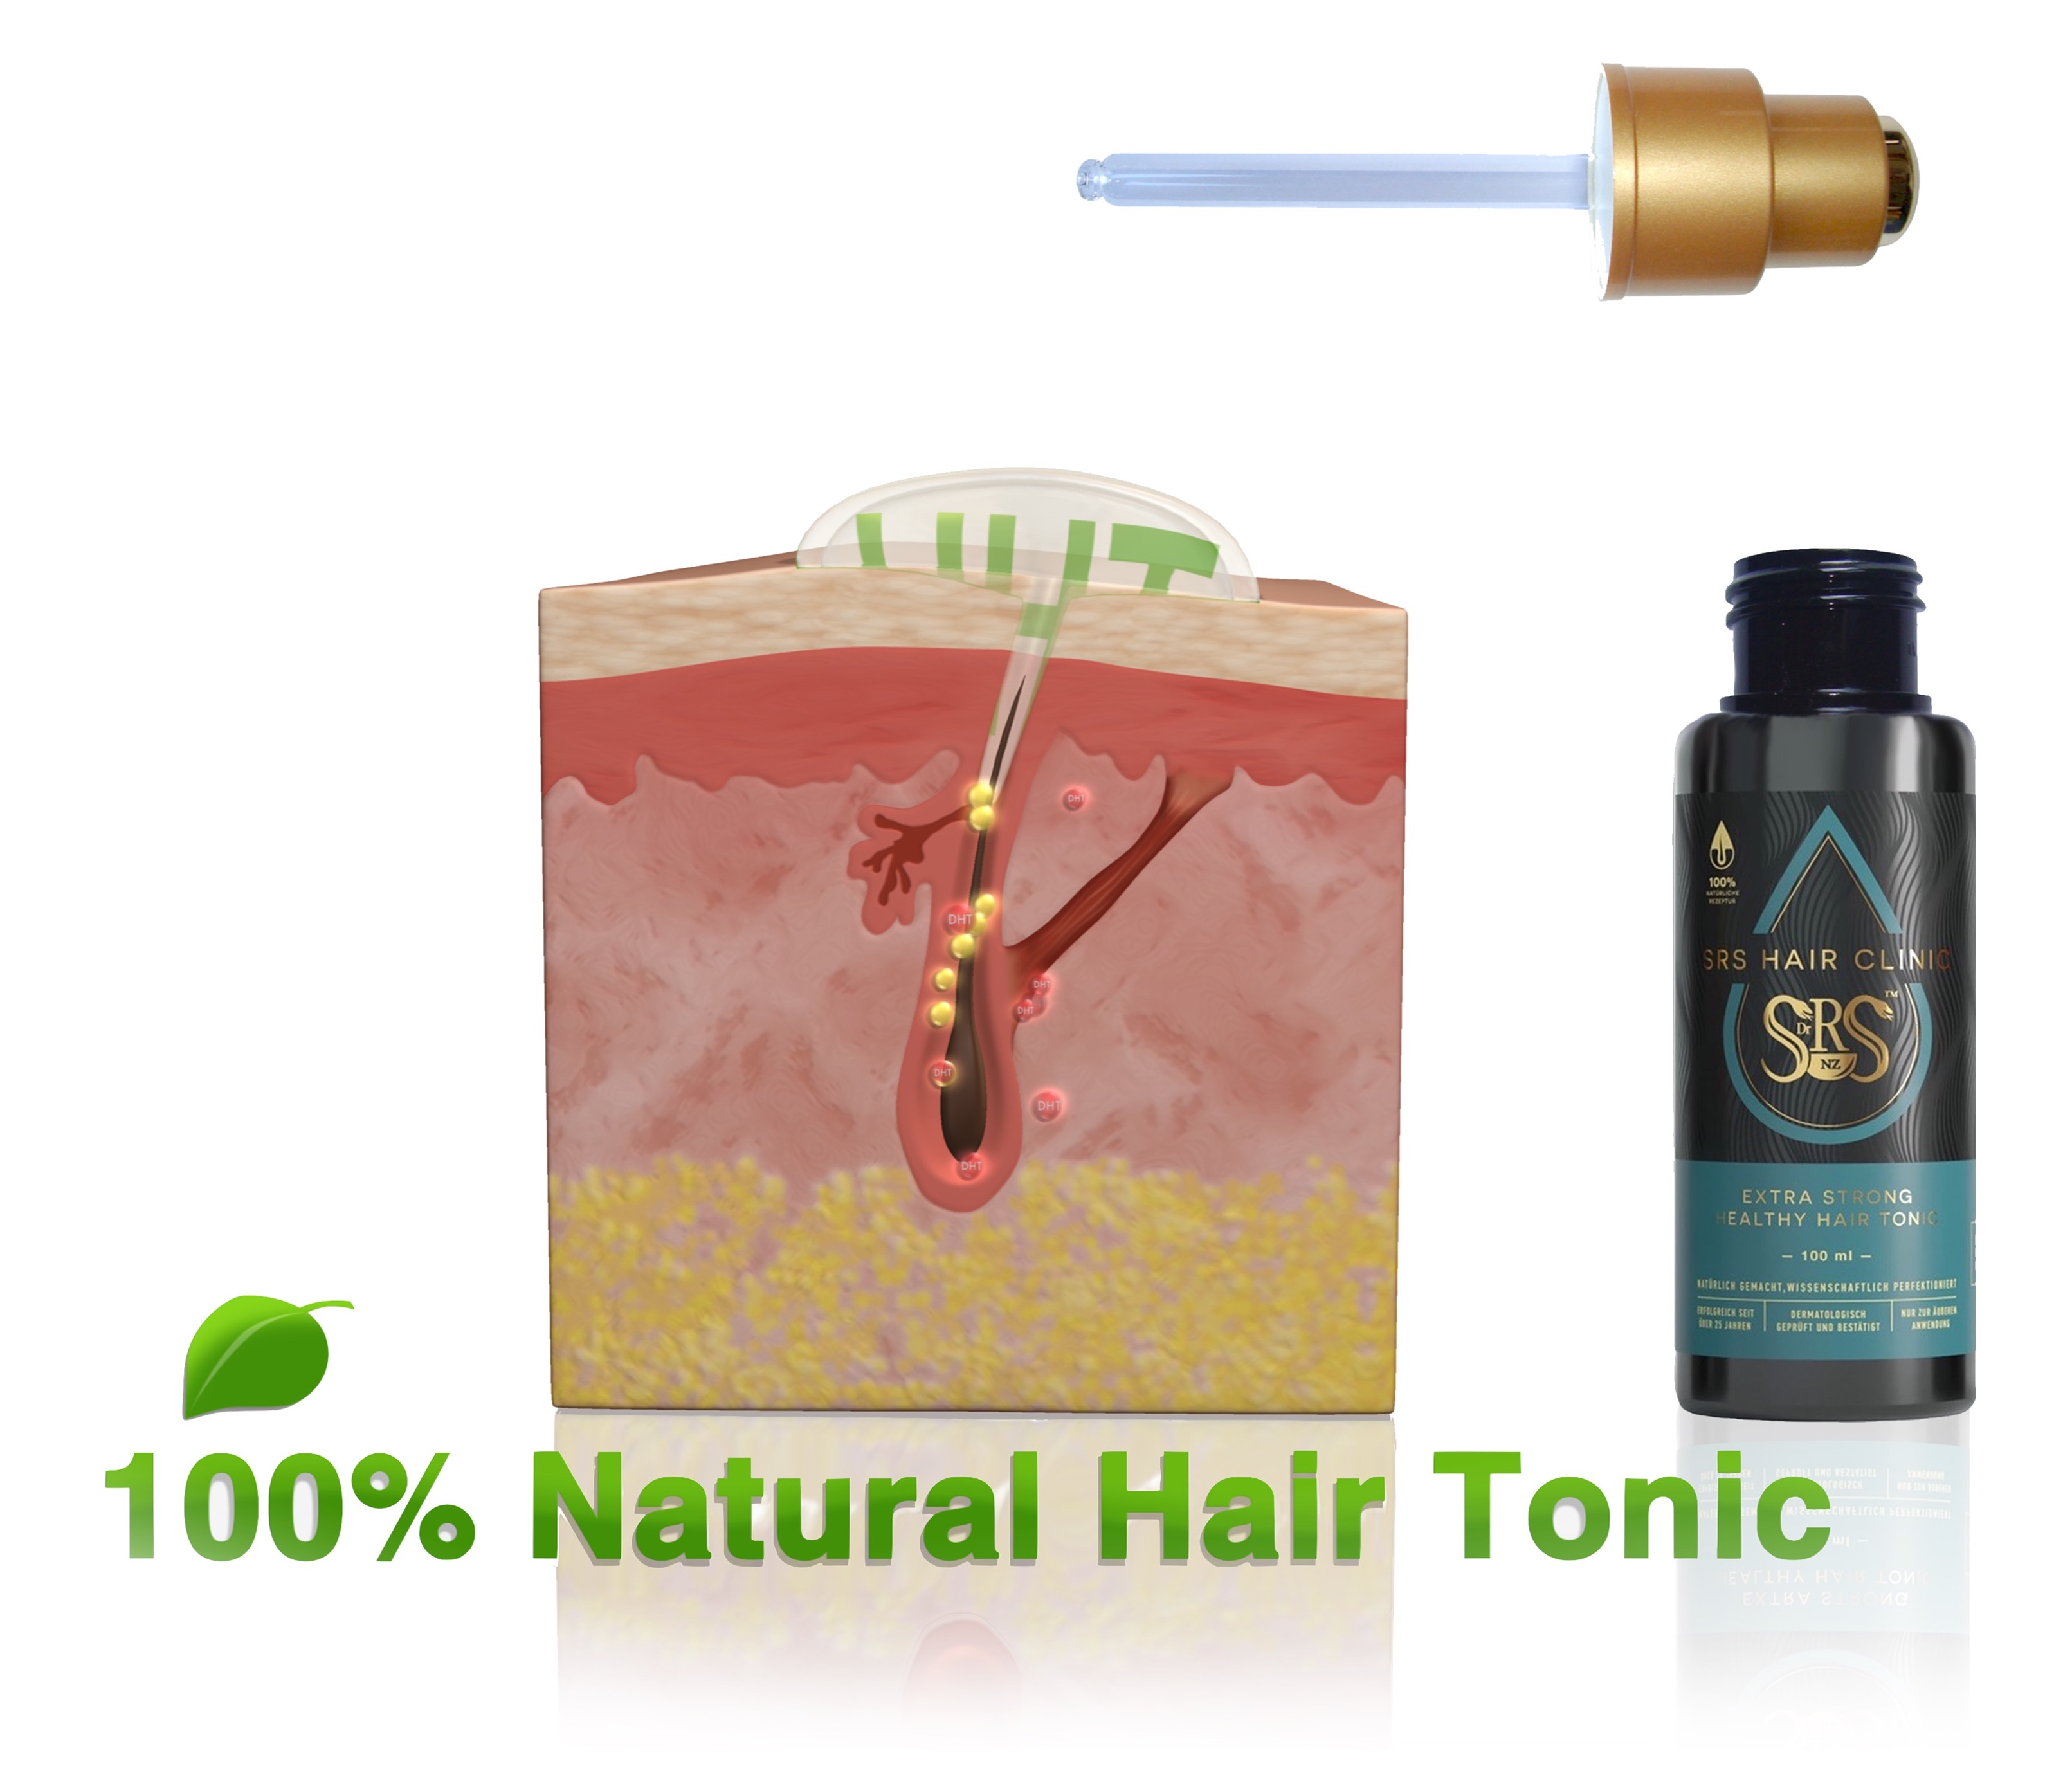 SRS-Healthy-Hair-Tonic